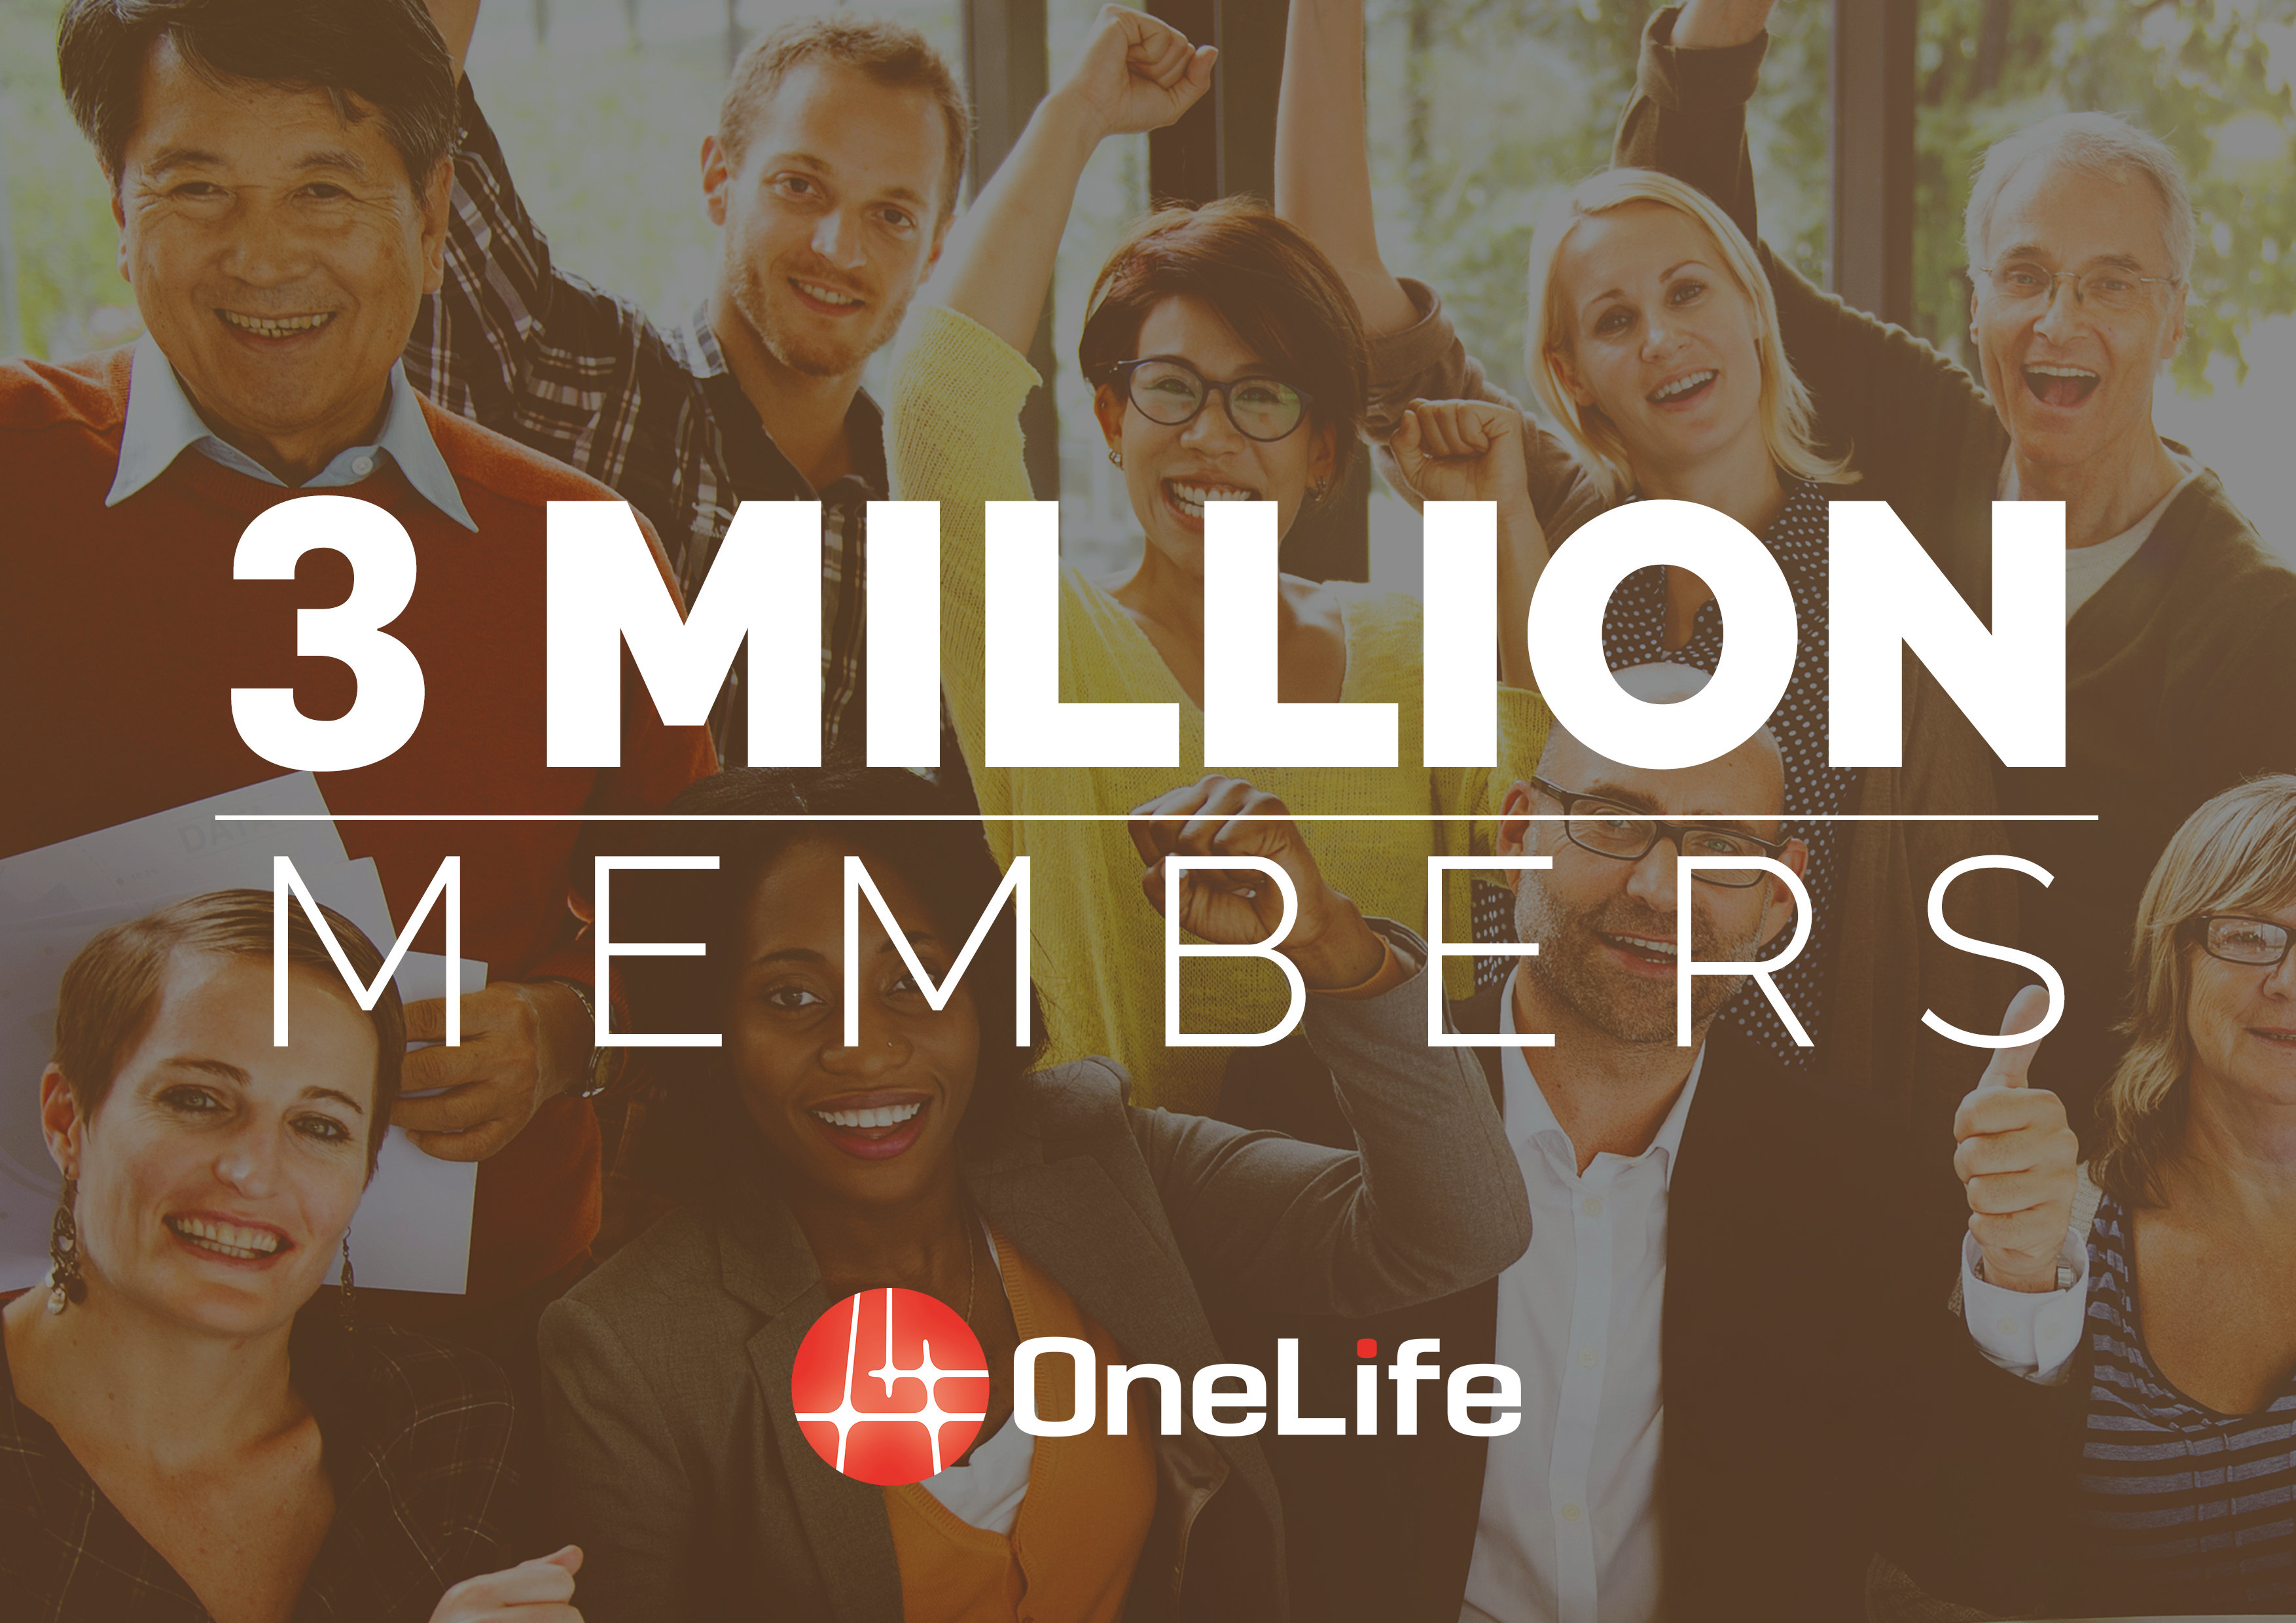 3 million members